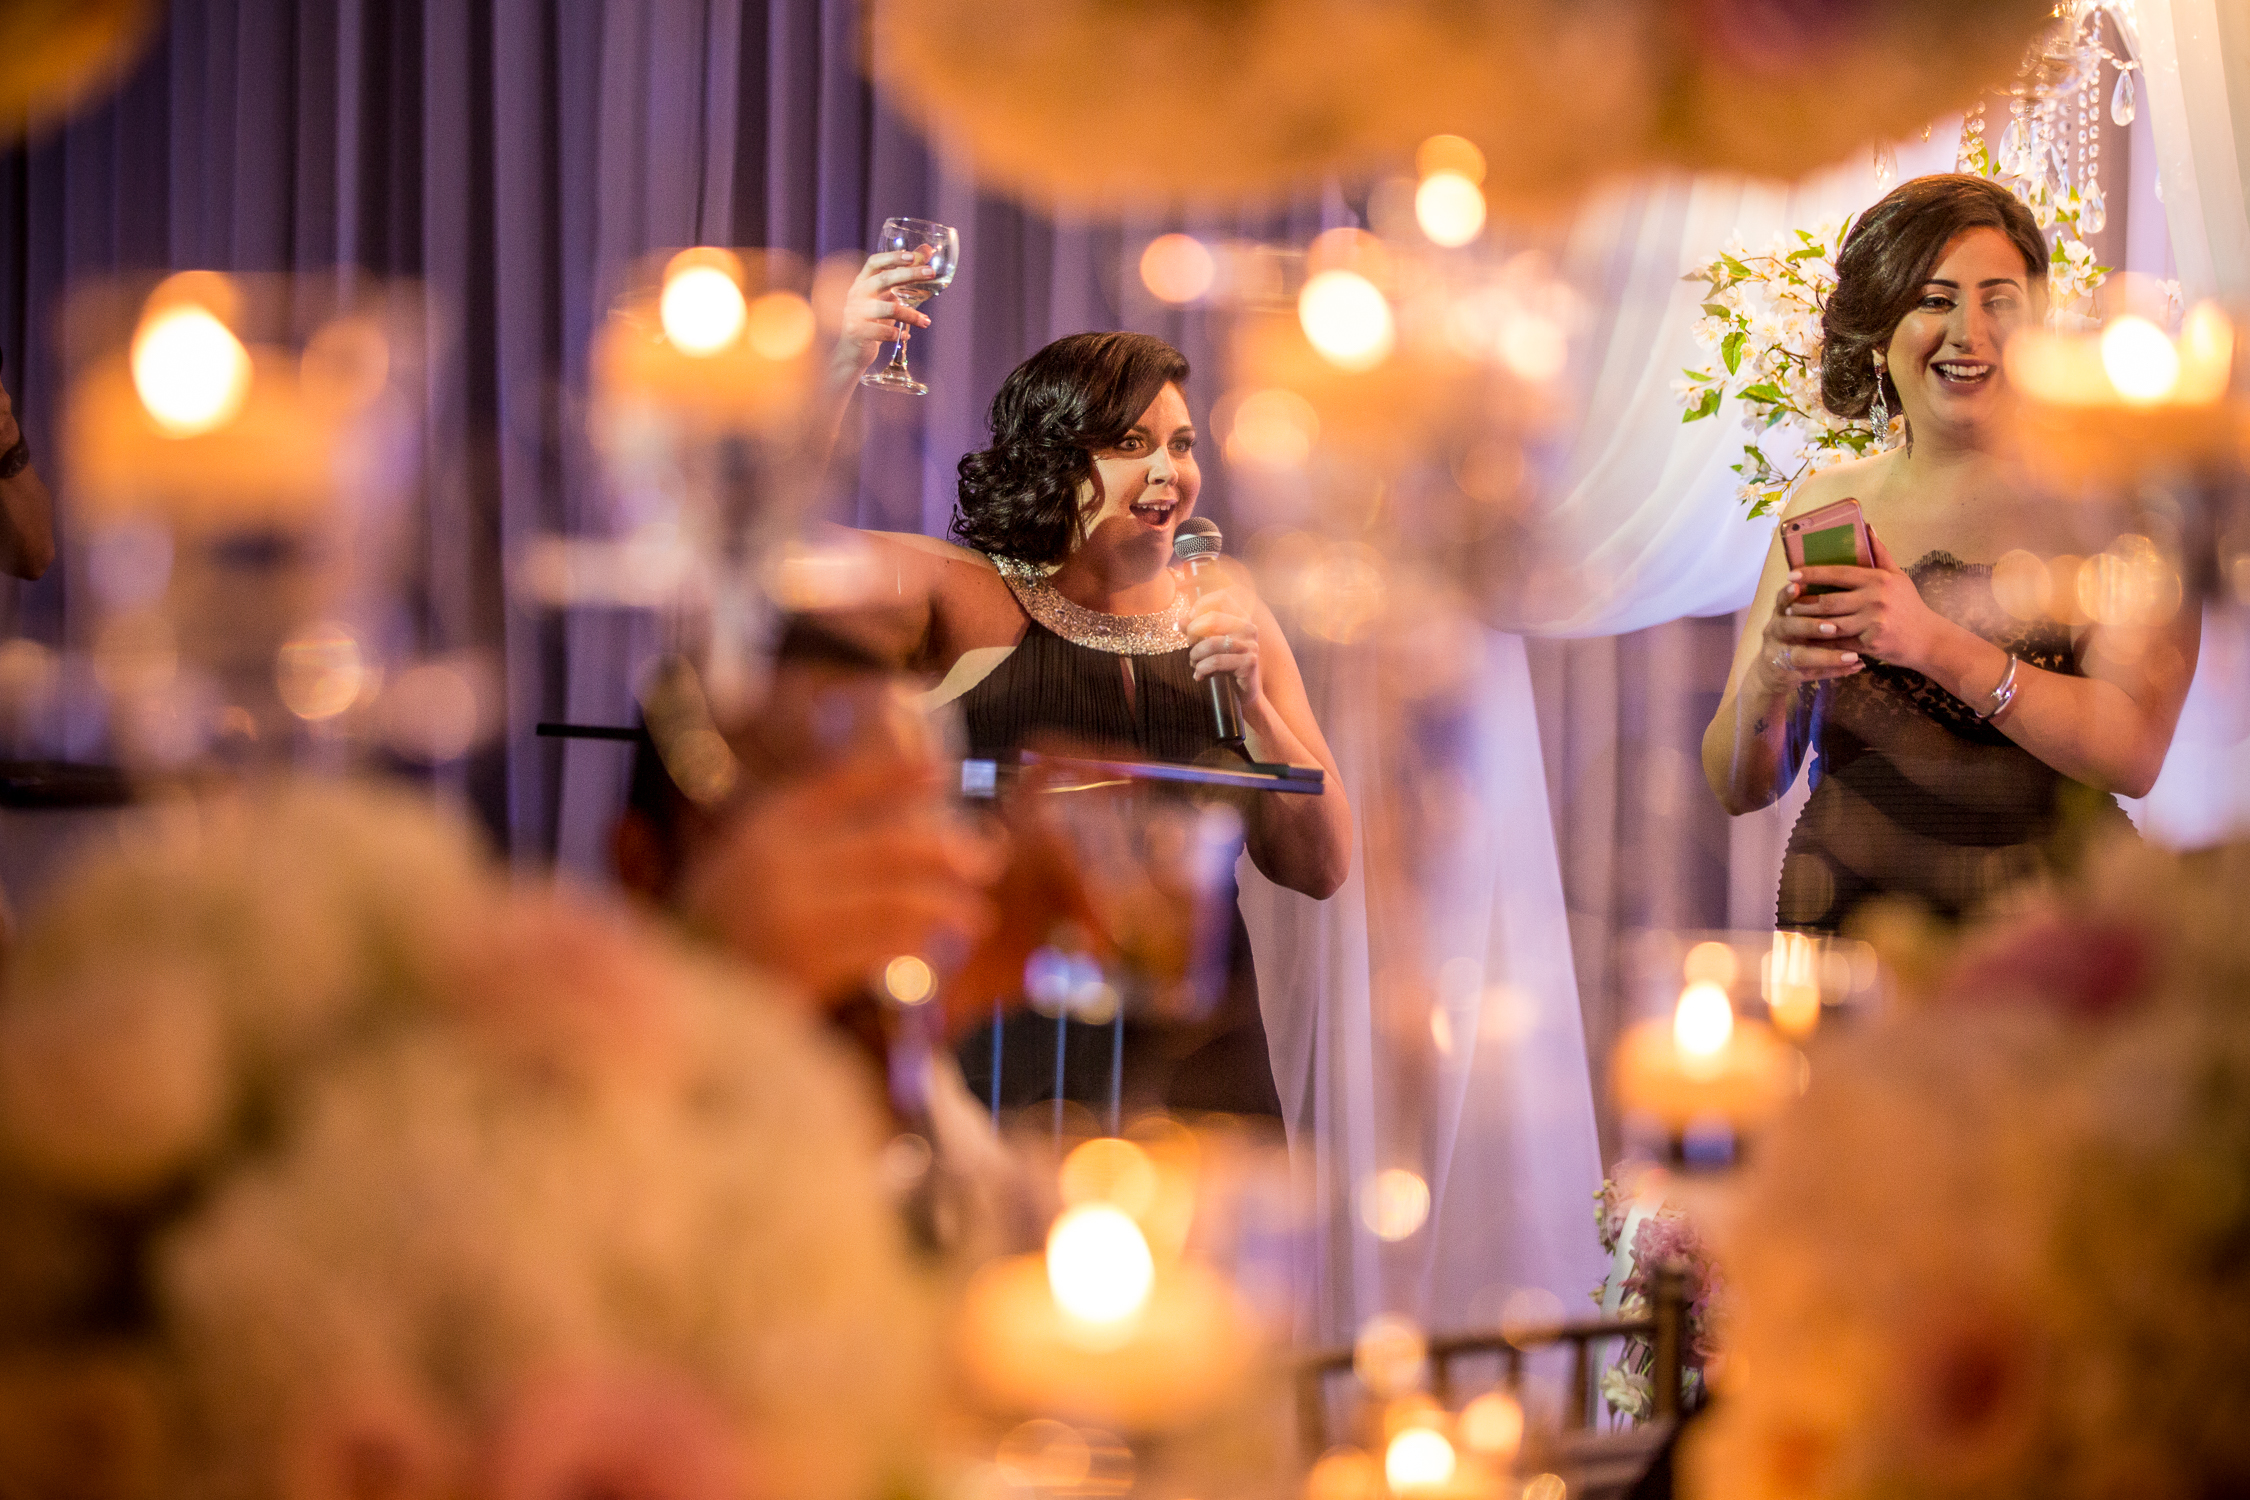 Peter-and-Marie-Wedding-Fontana-Primavera-Graydon-Hall-Manor-Toronto-Ontario-Canada-0047.jpg